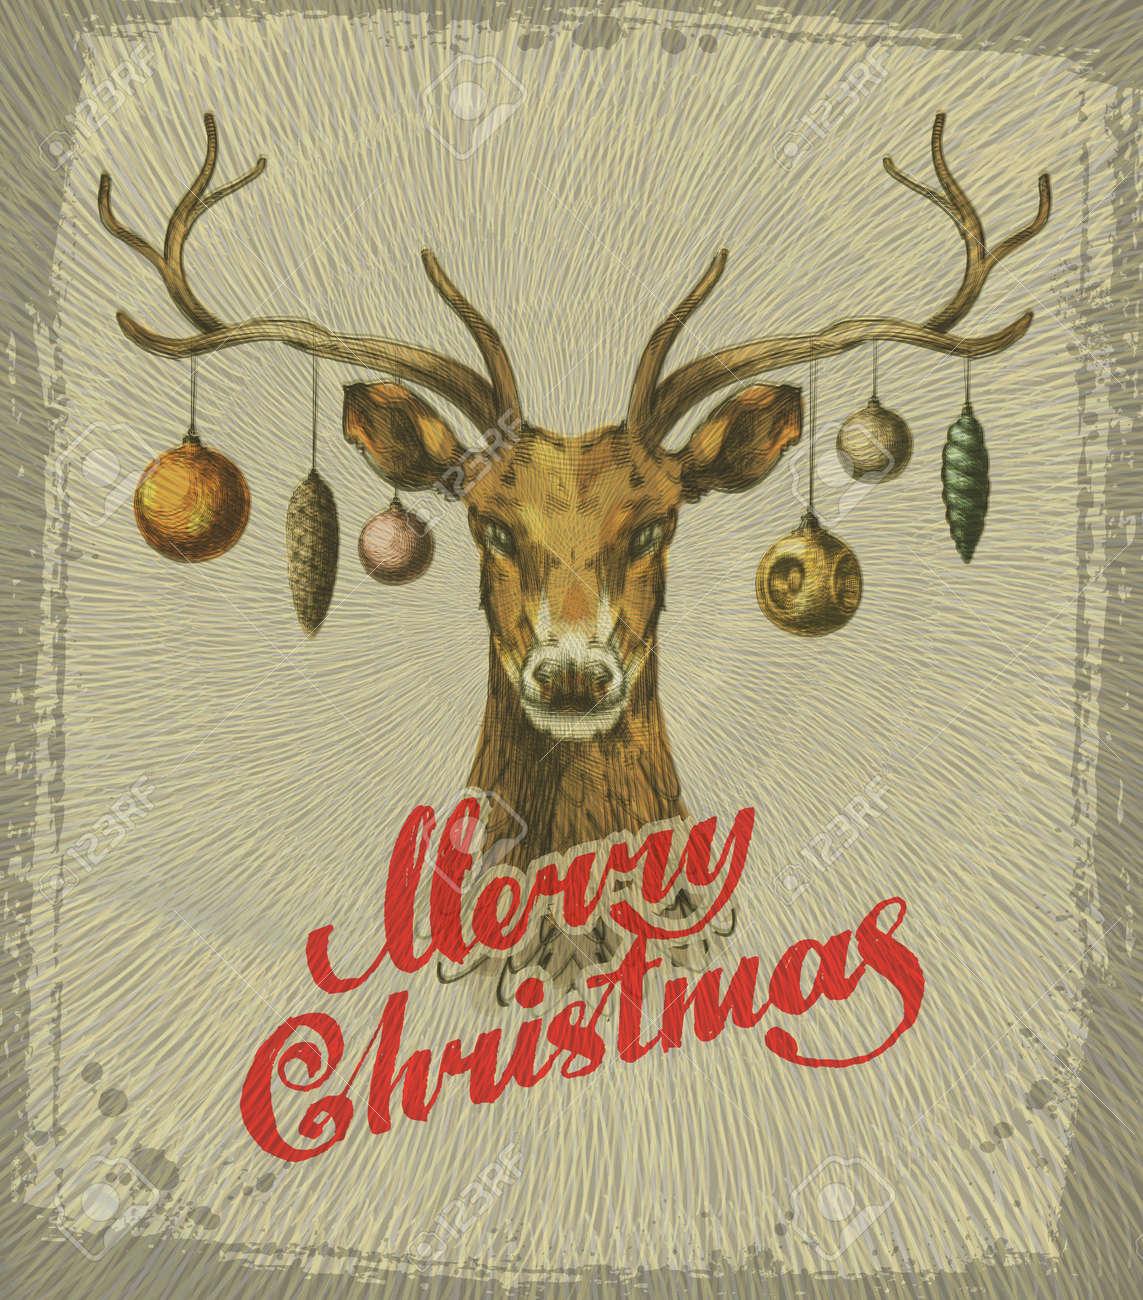 Merry Christmas. Vintage Christmas card. deer. Vector illustration